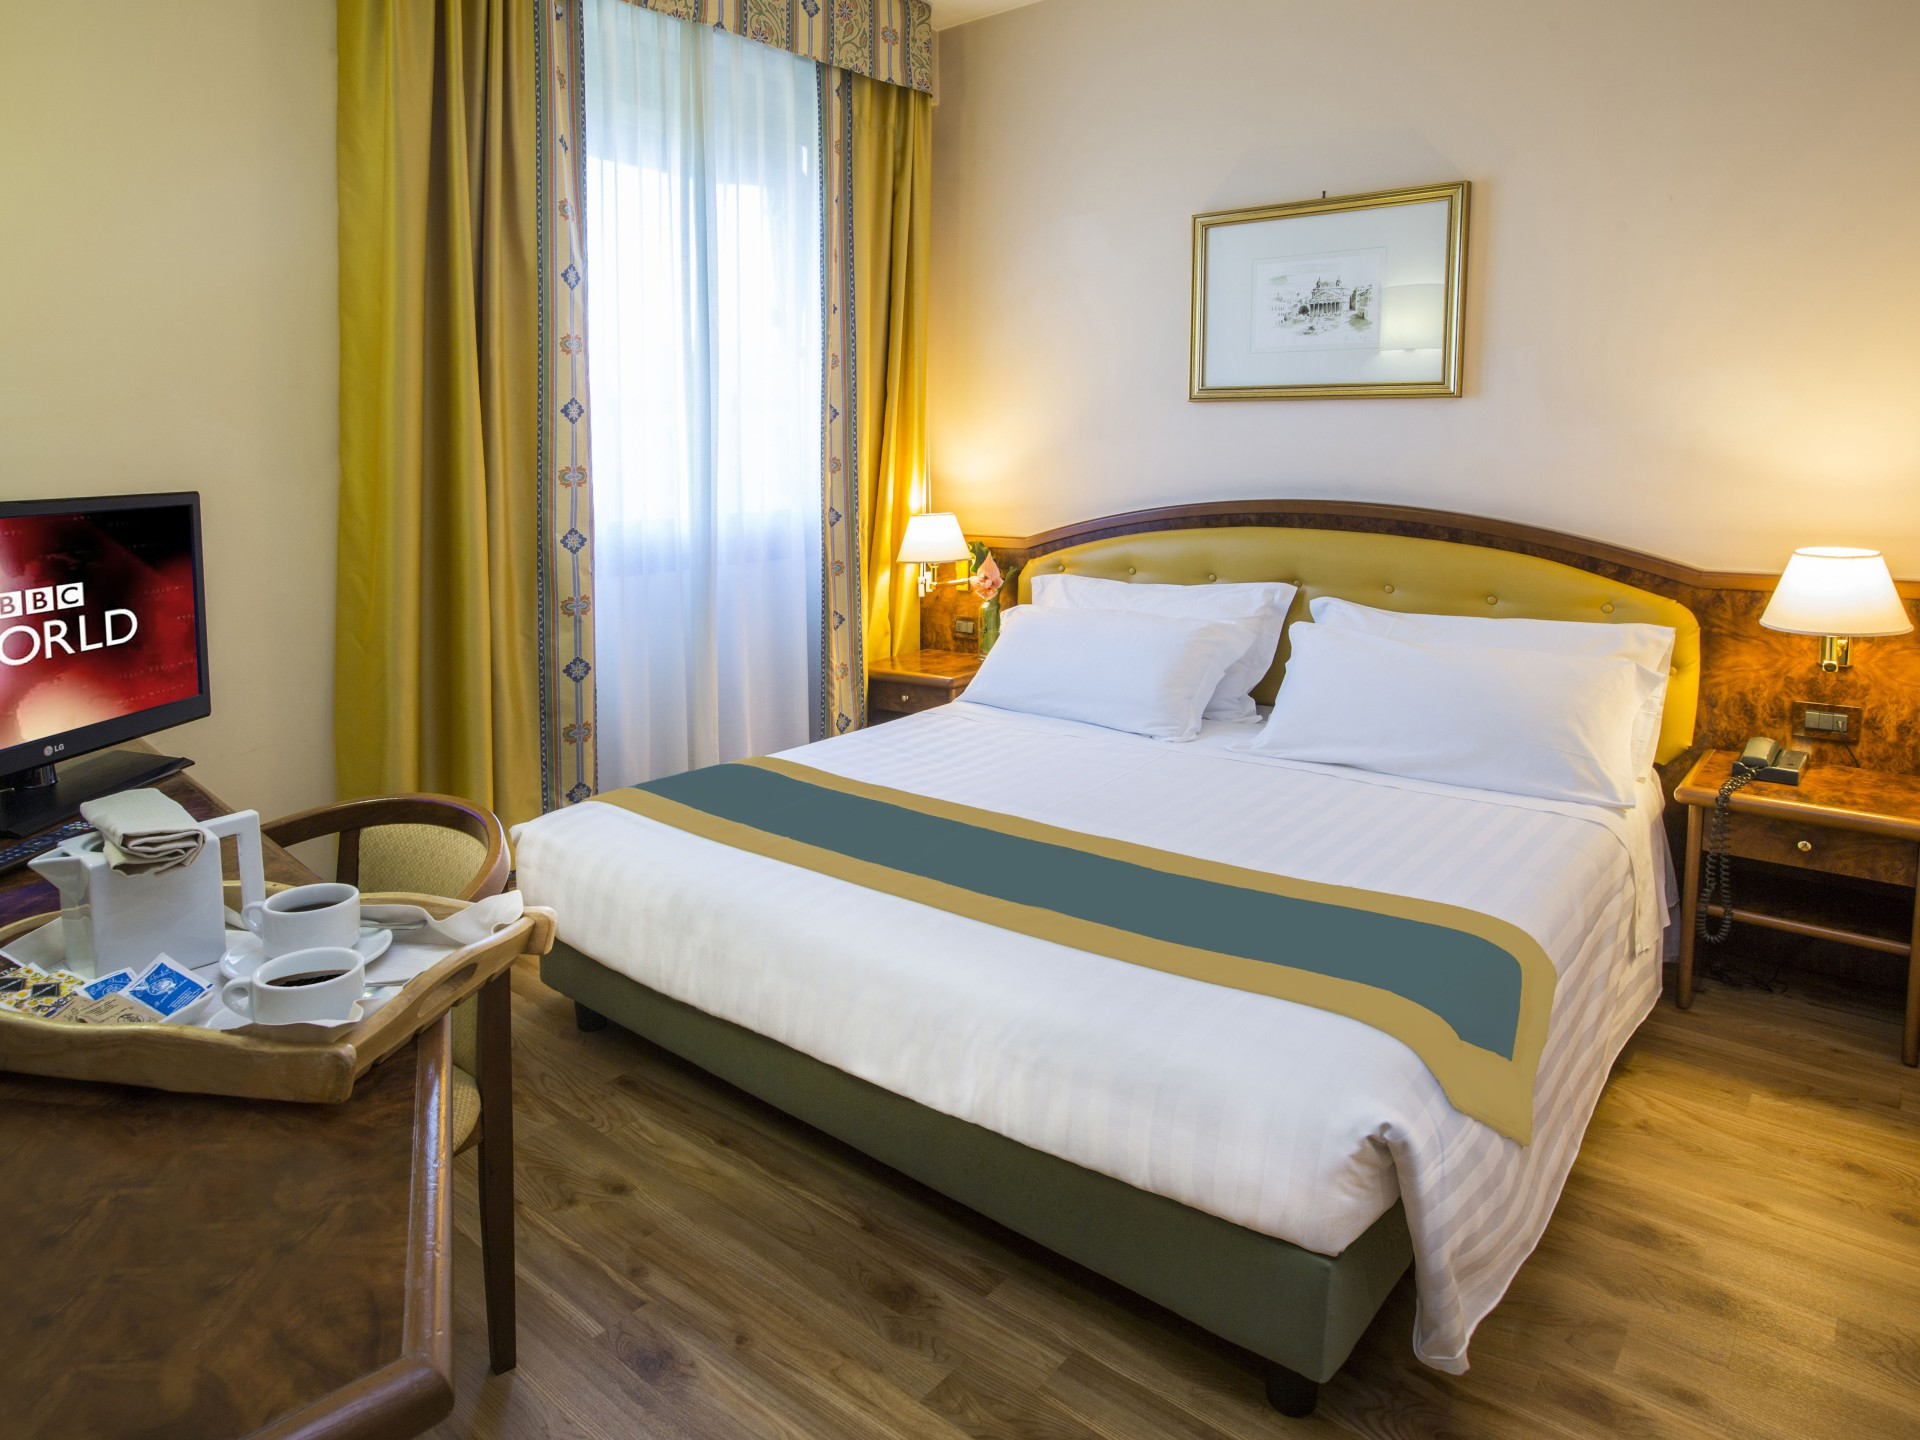 Best Western Park Hotel Fiano Romano****Classic